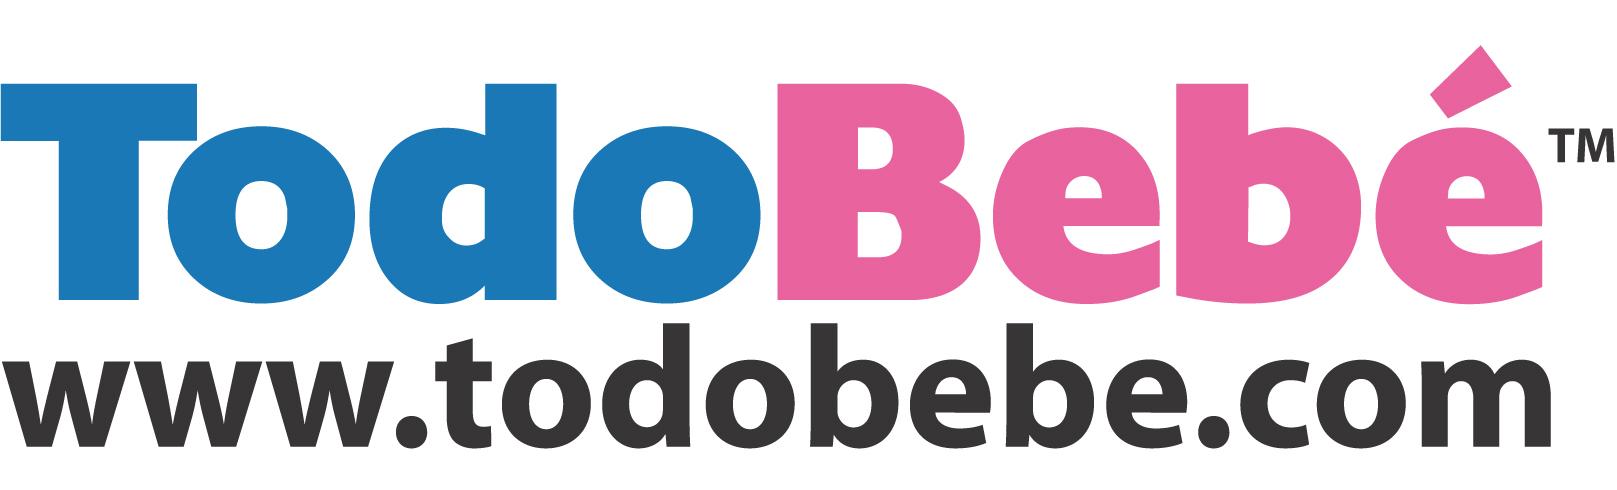 'Feria Todobebe en Walmart' Stops in Miami, Houston, LA & More